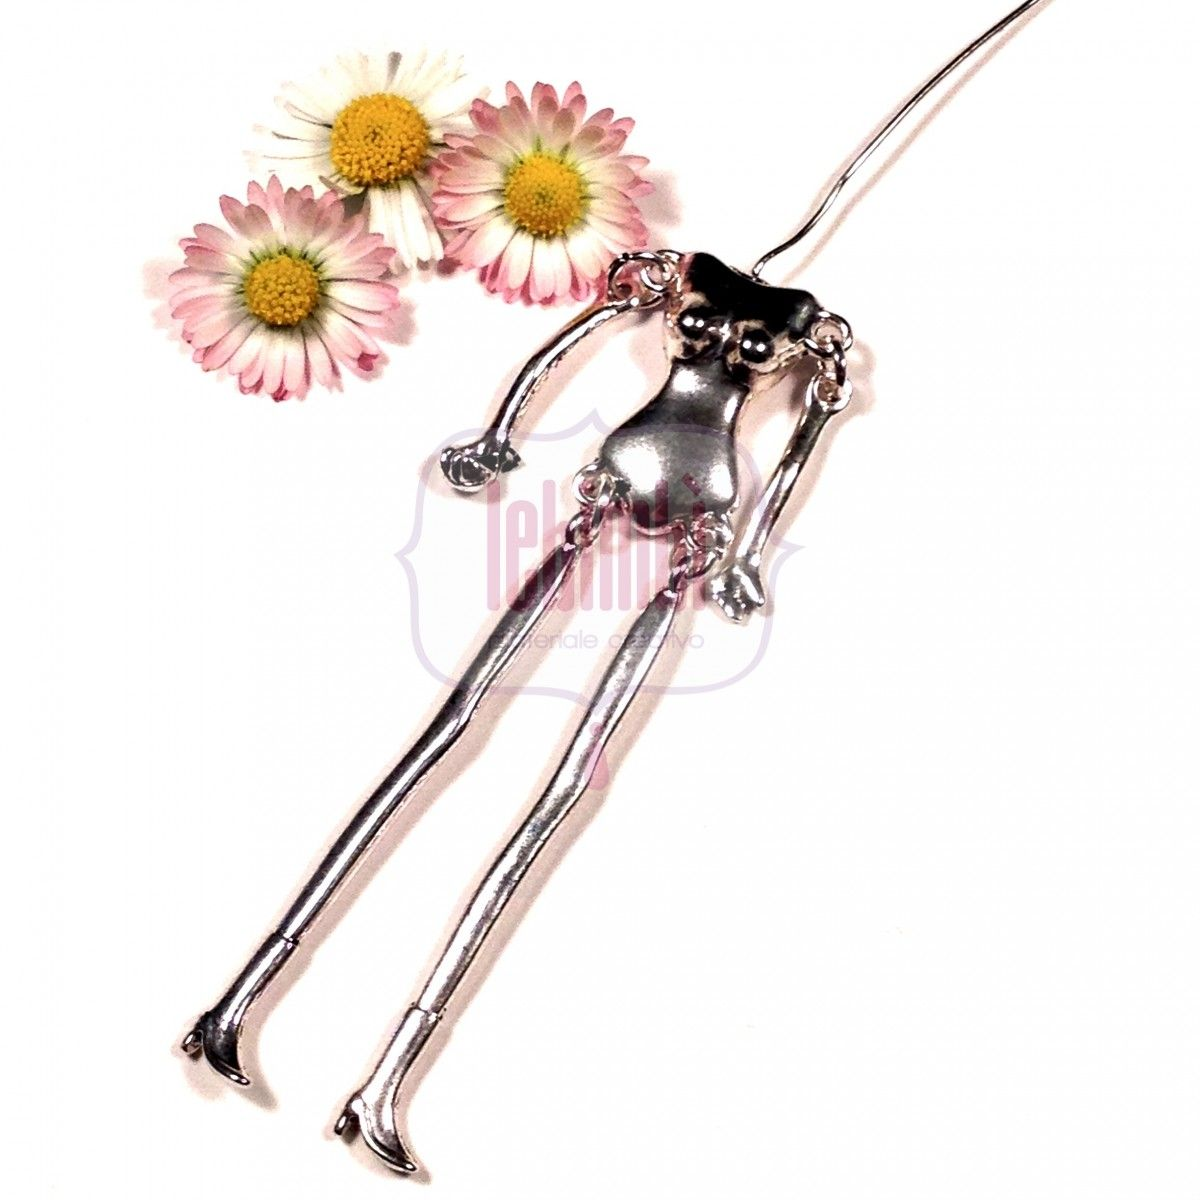 Base corpo in metallo, Argento antico, 115x18mm NICKEL FREE -1pc